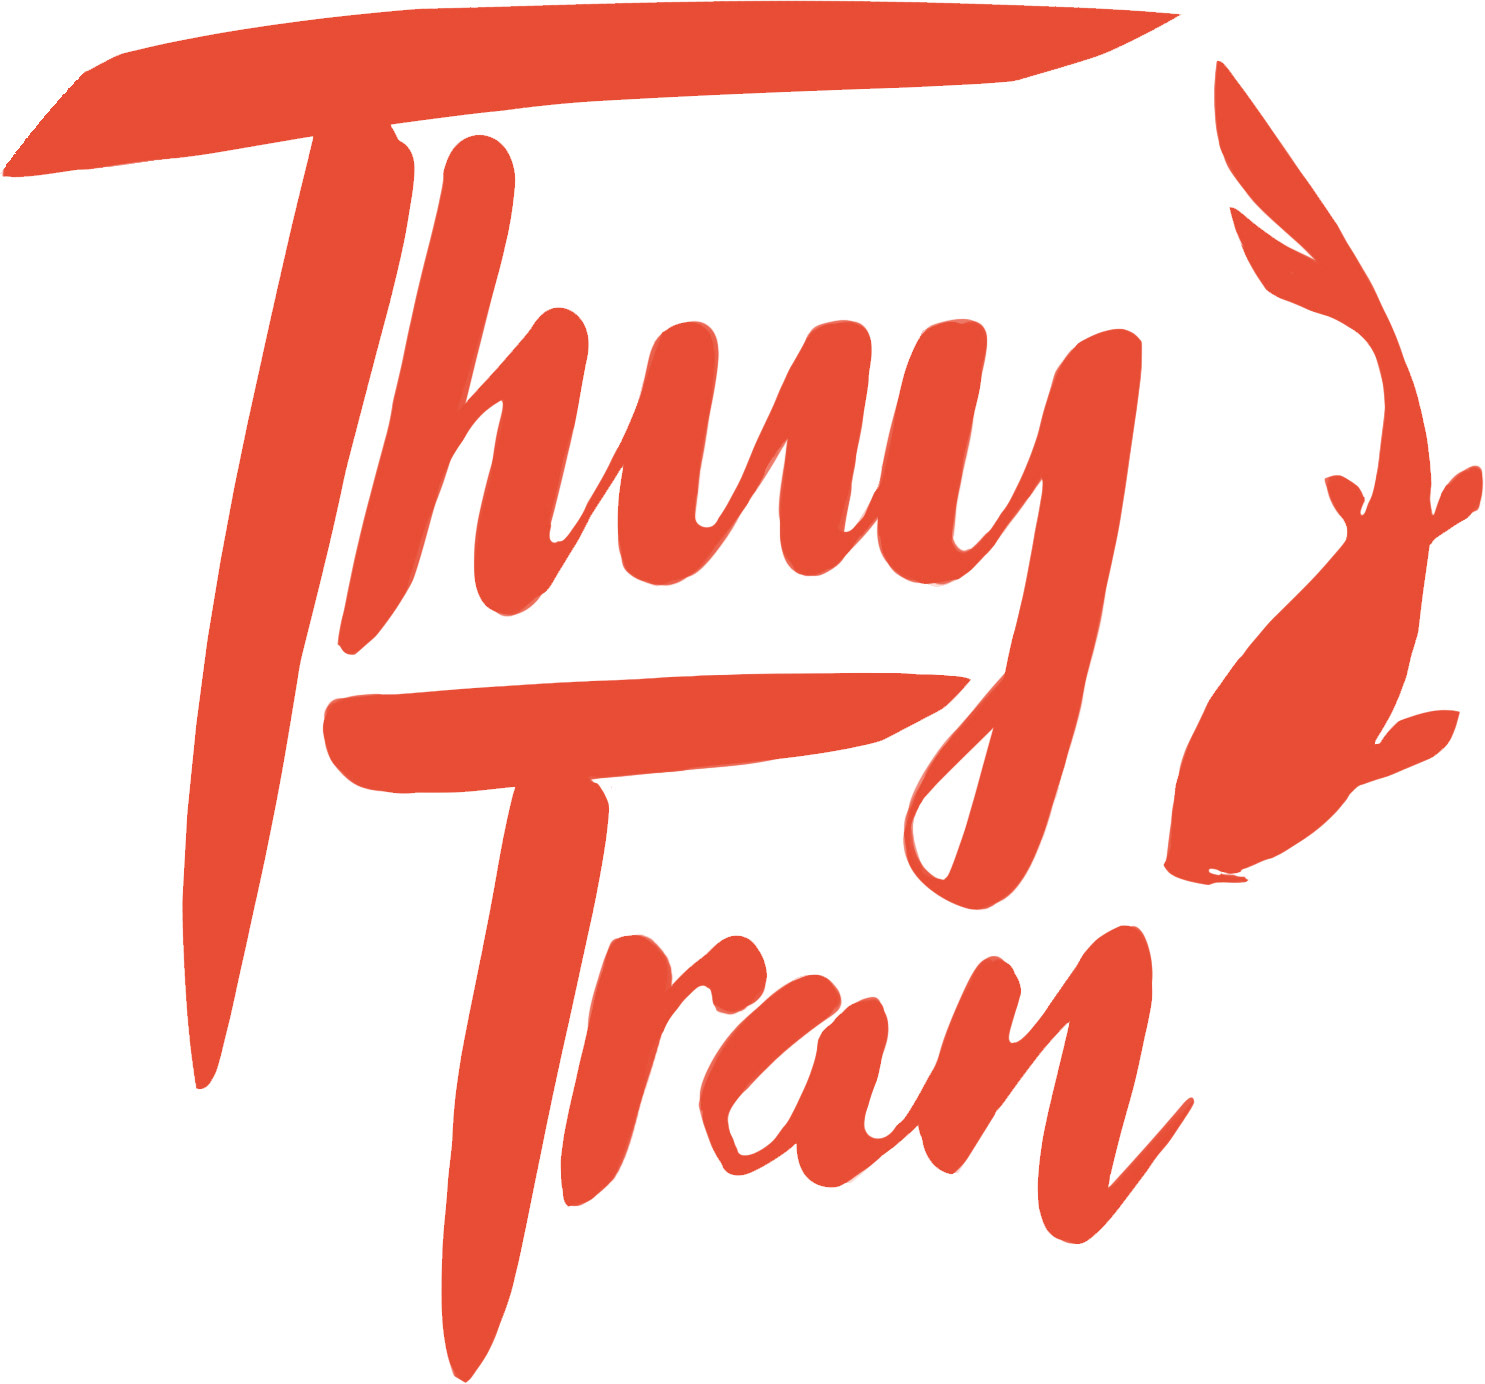 Thuy Tran